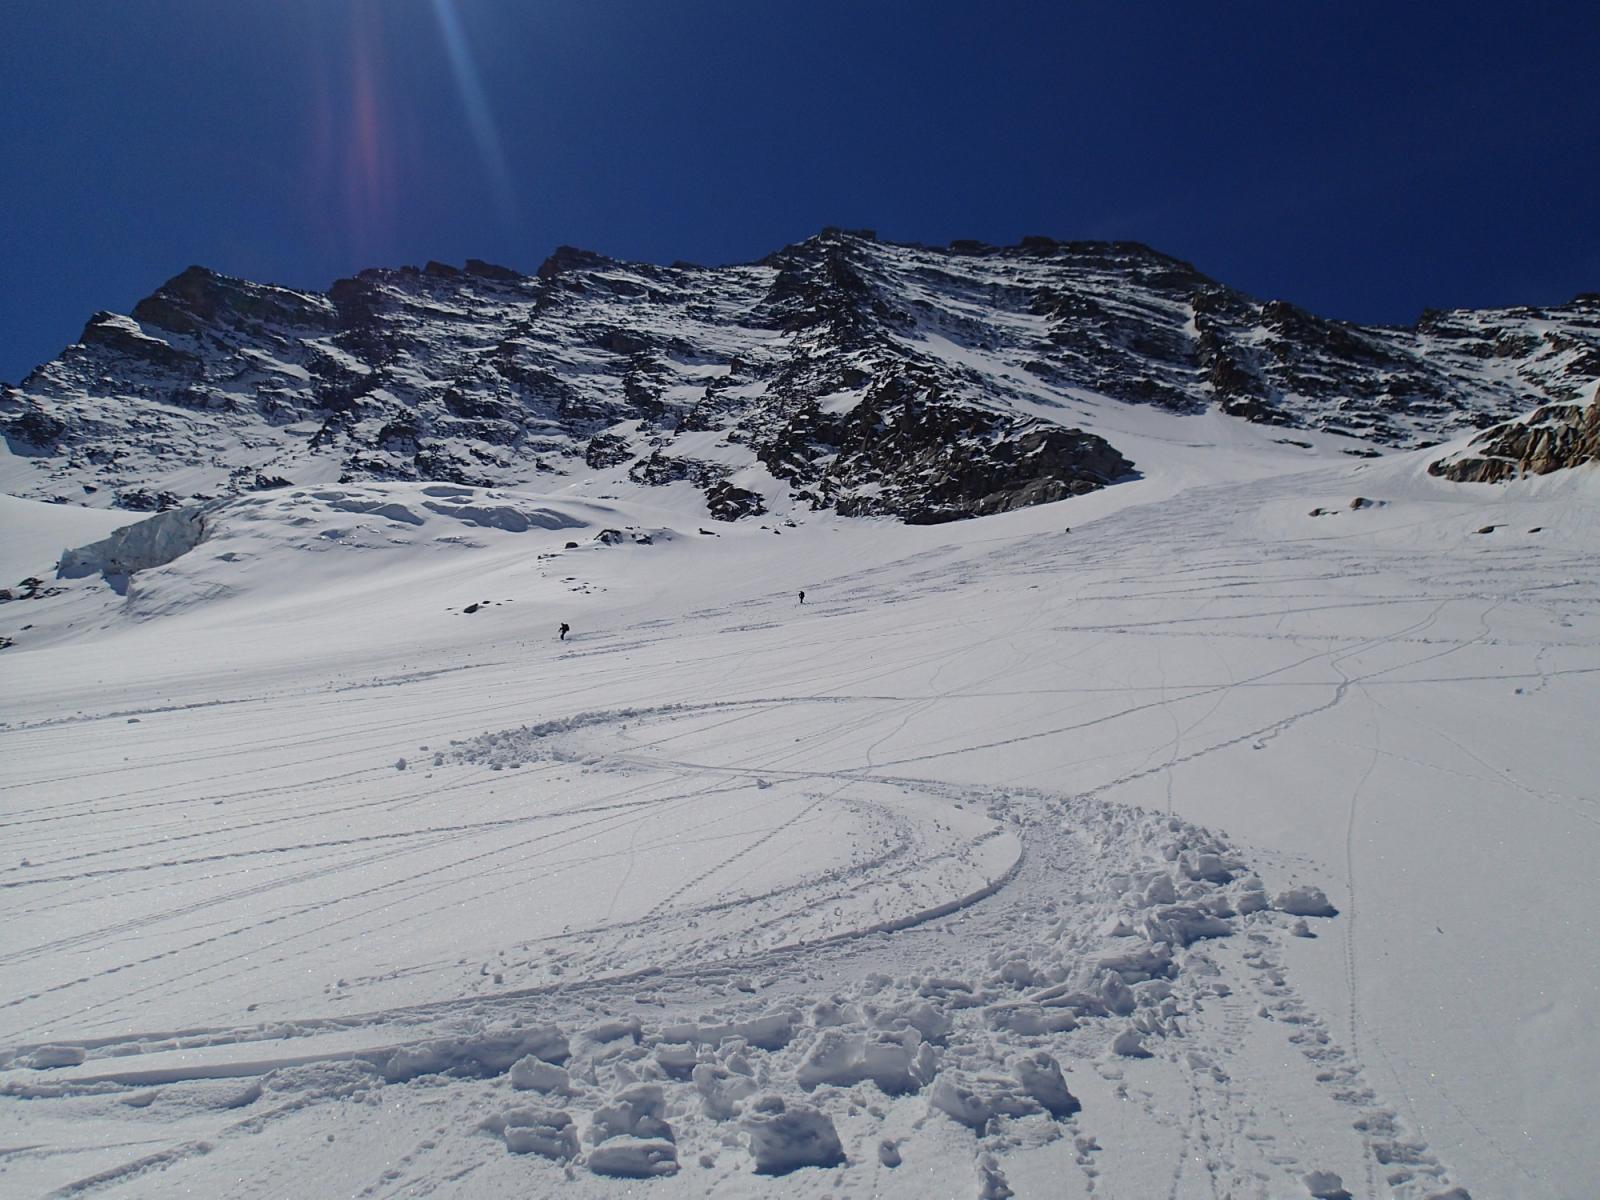 Gran sciata